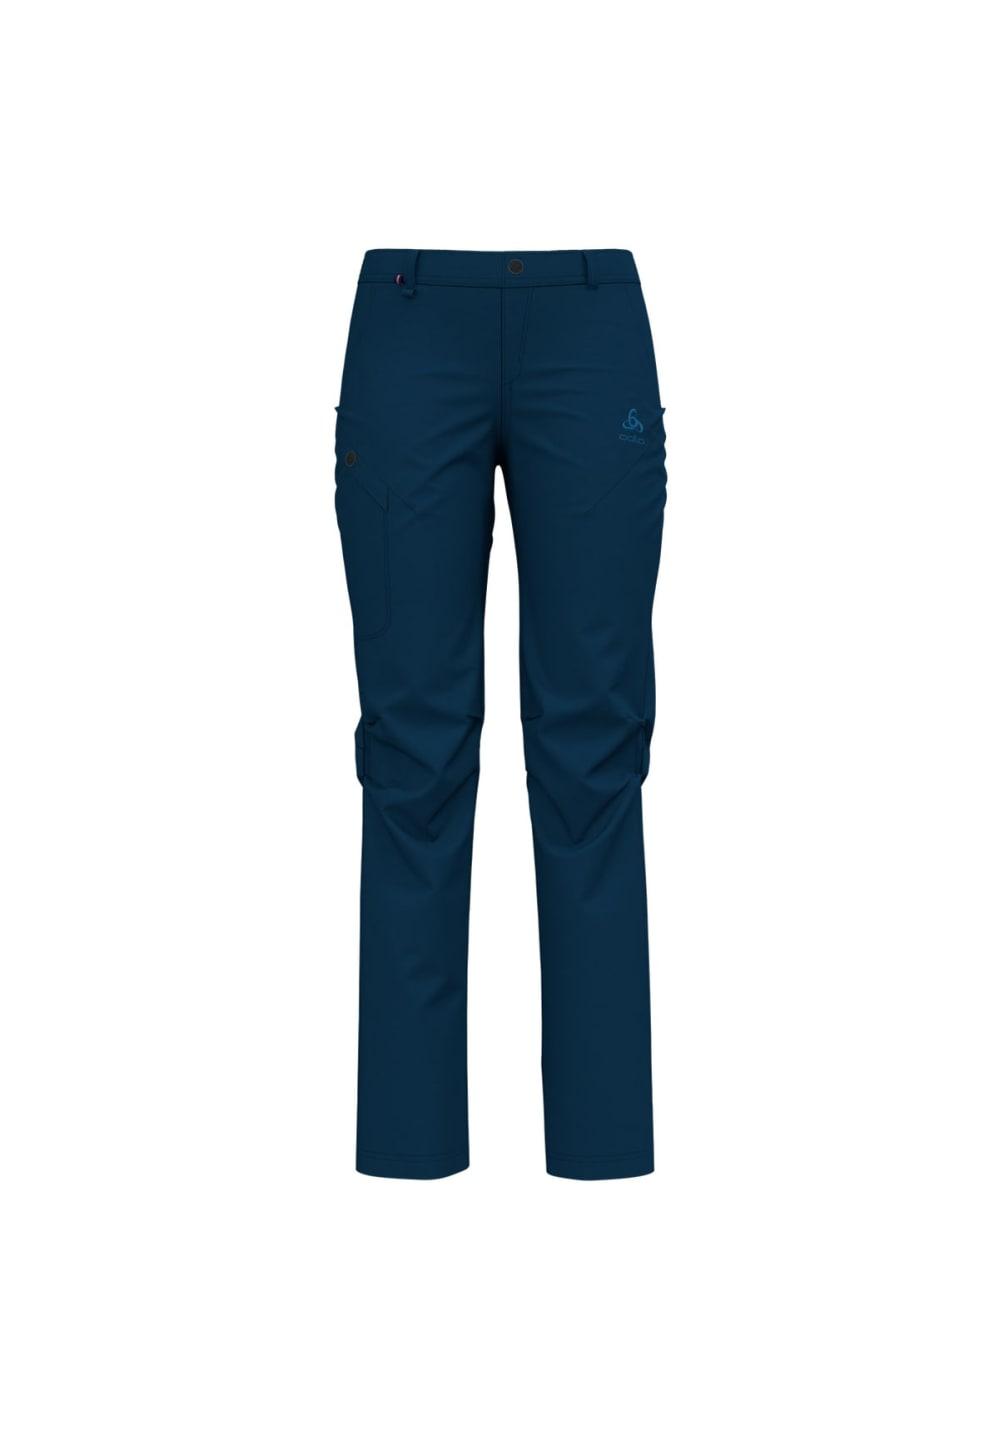 Odlo Pants Alta Badia - Outdoor für Damen - Blau